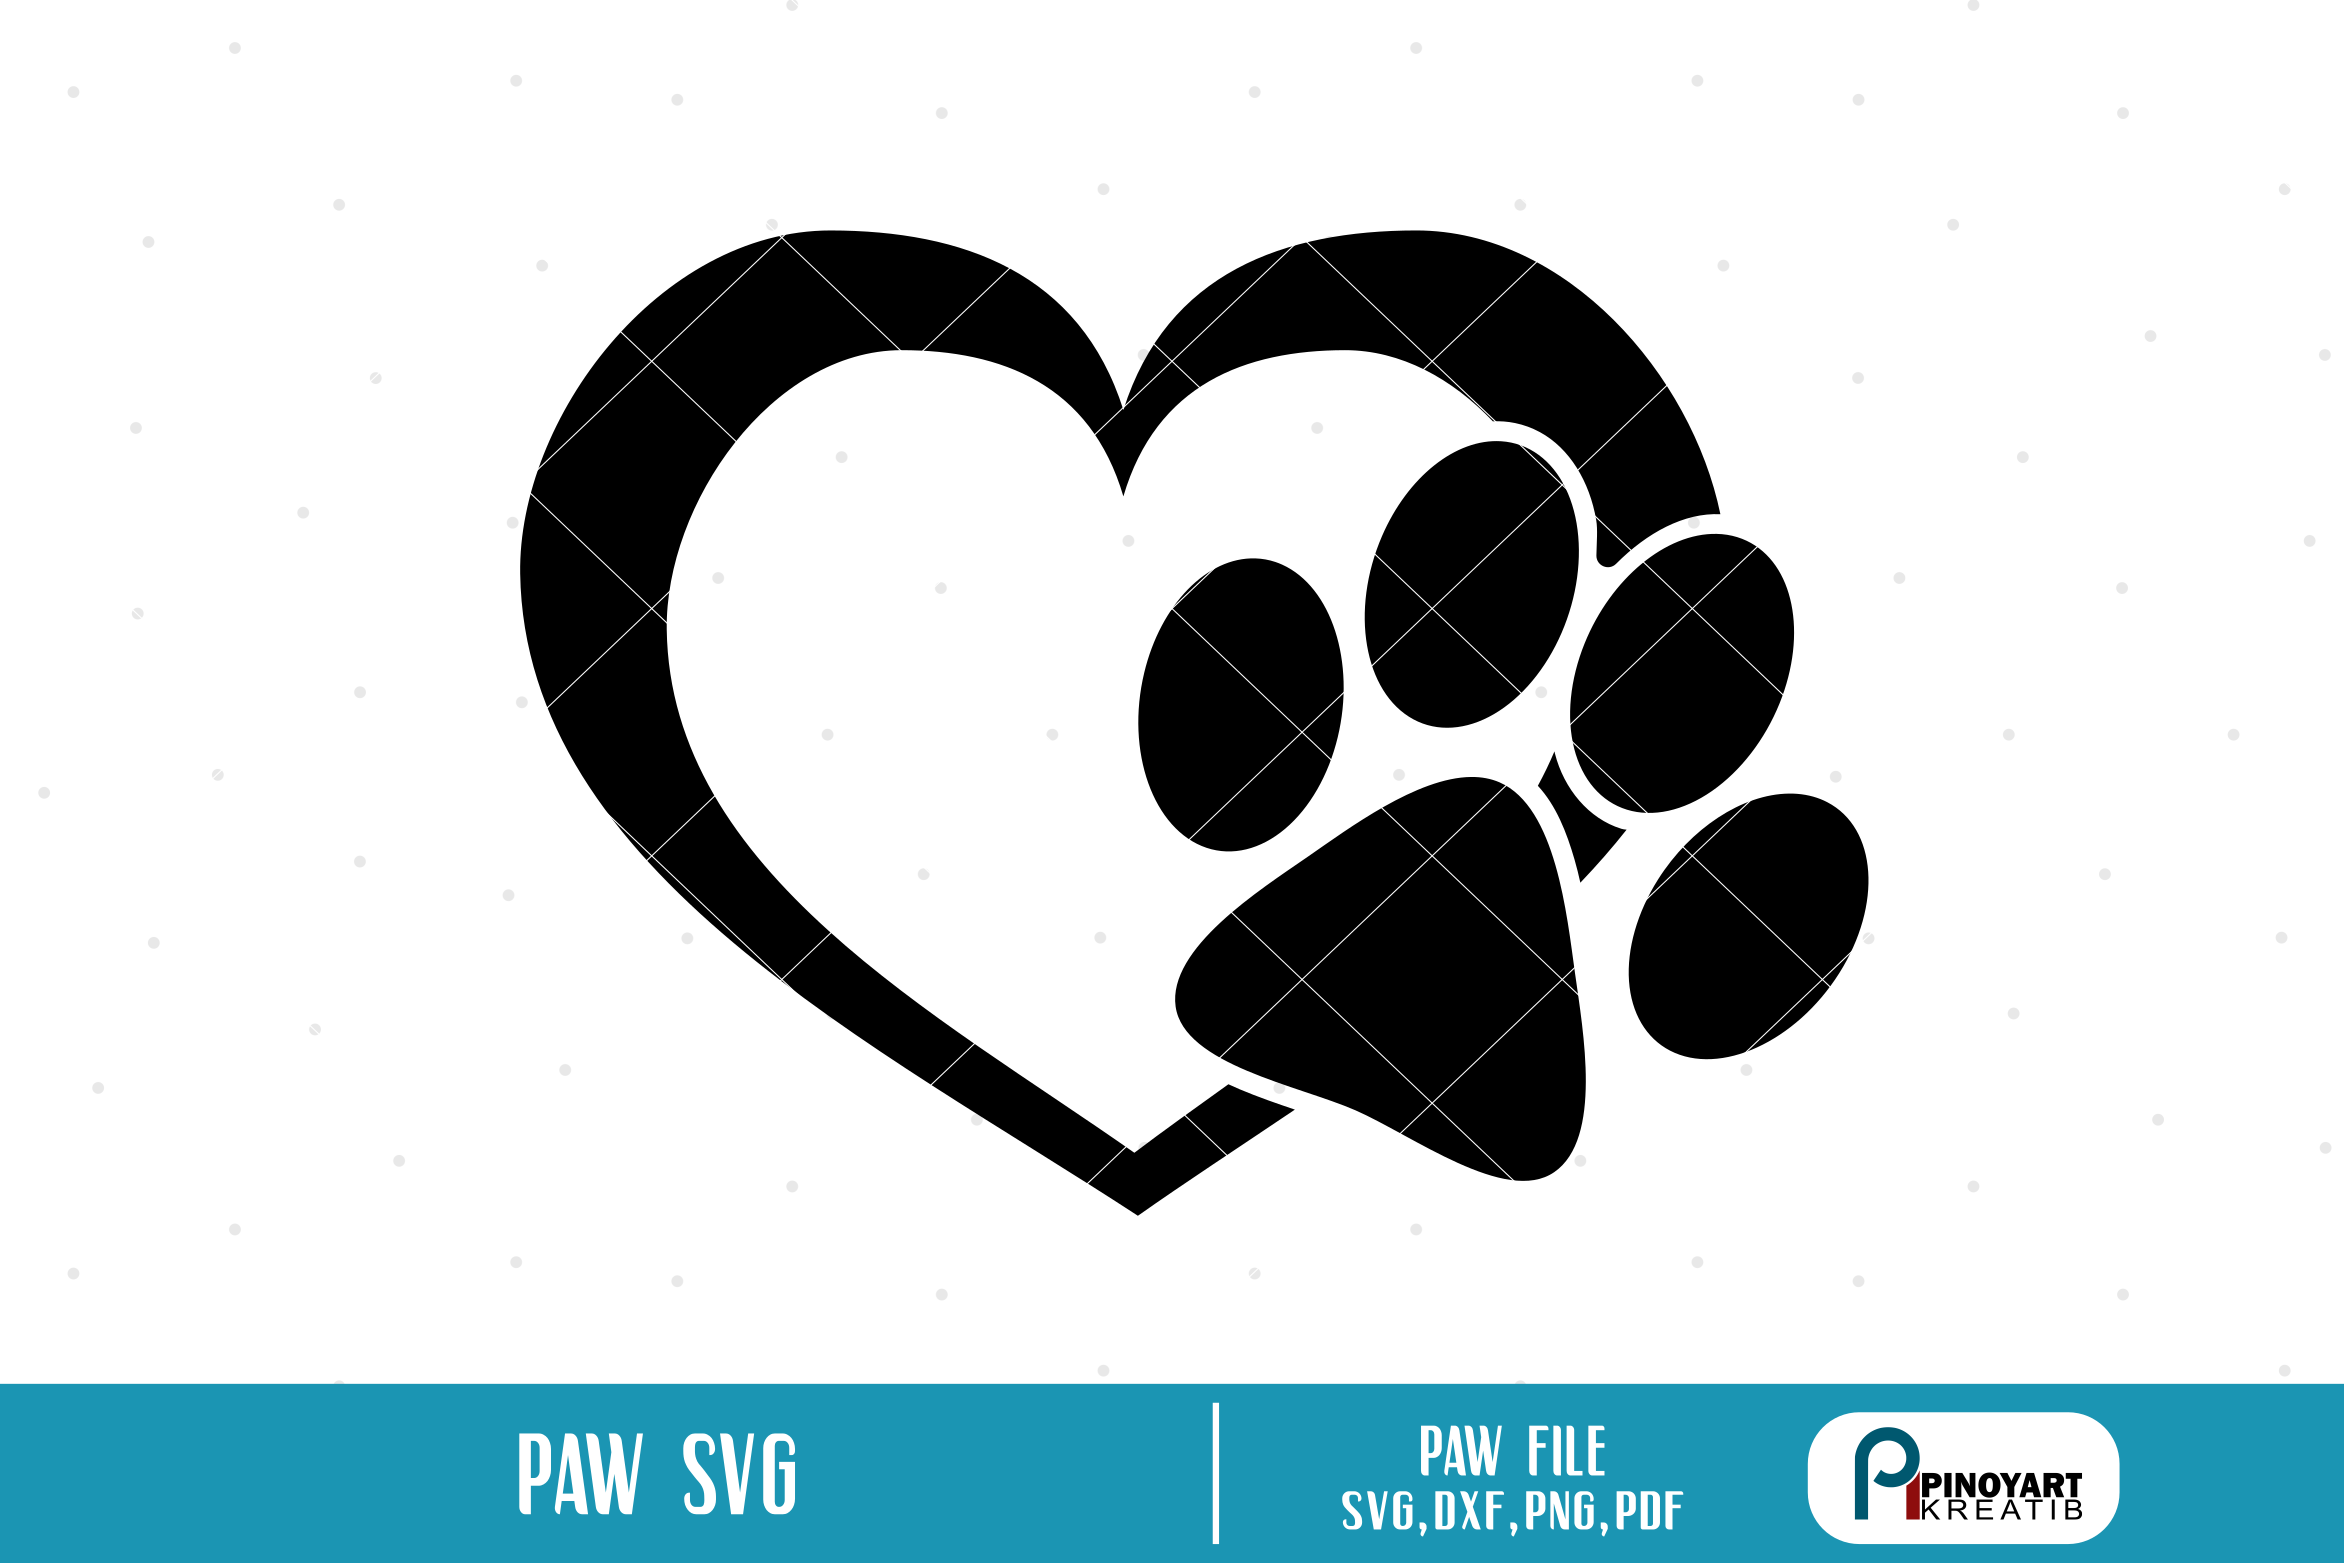 Download paw svg,paw svg file,paw clip art,paw prints,dog svg ...